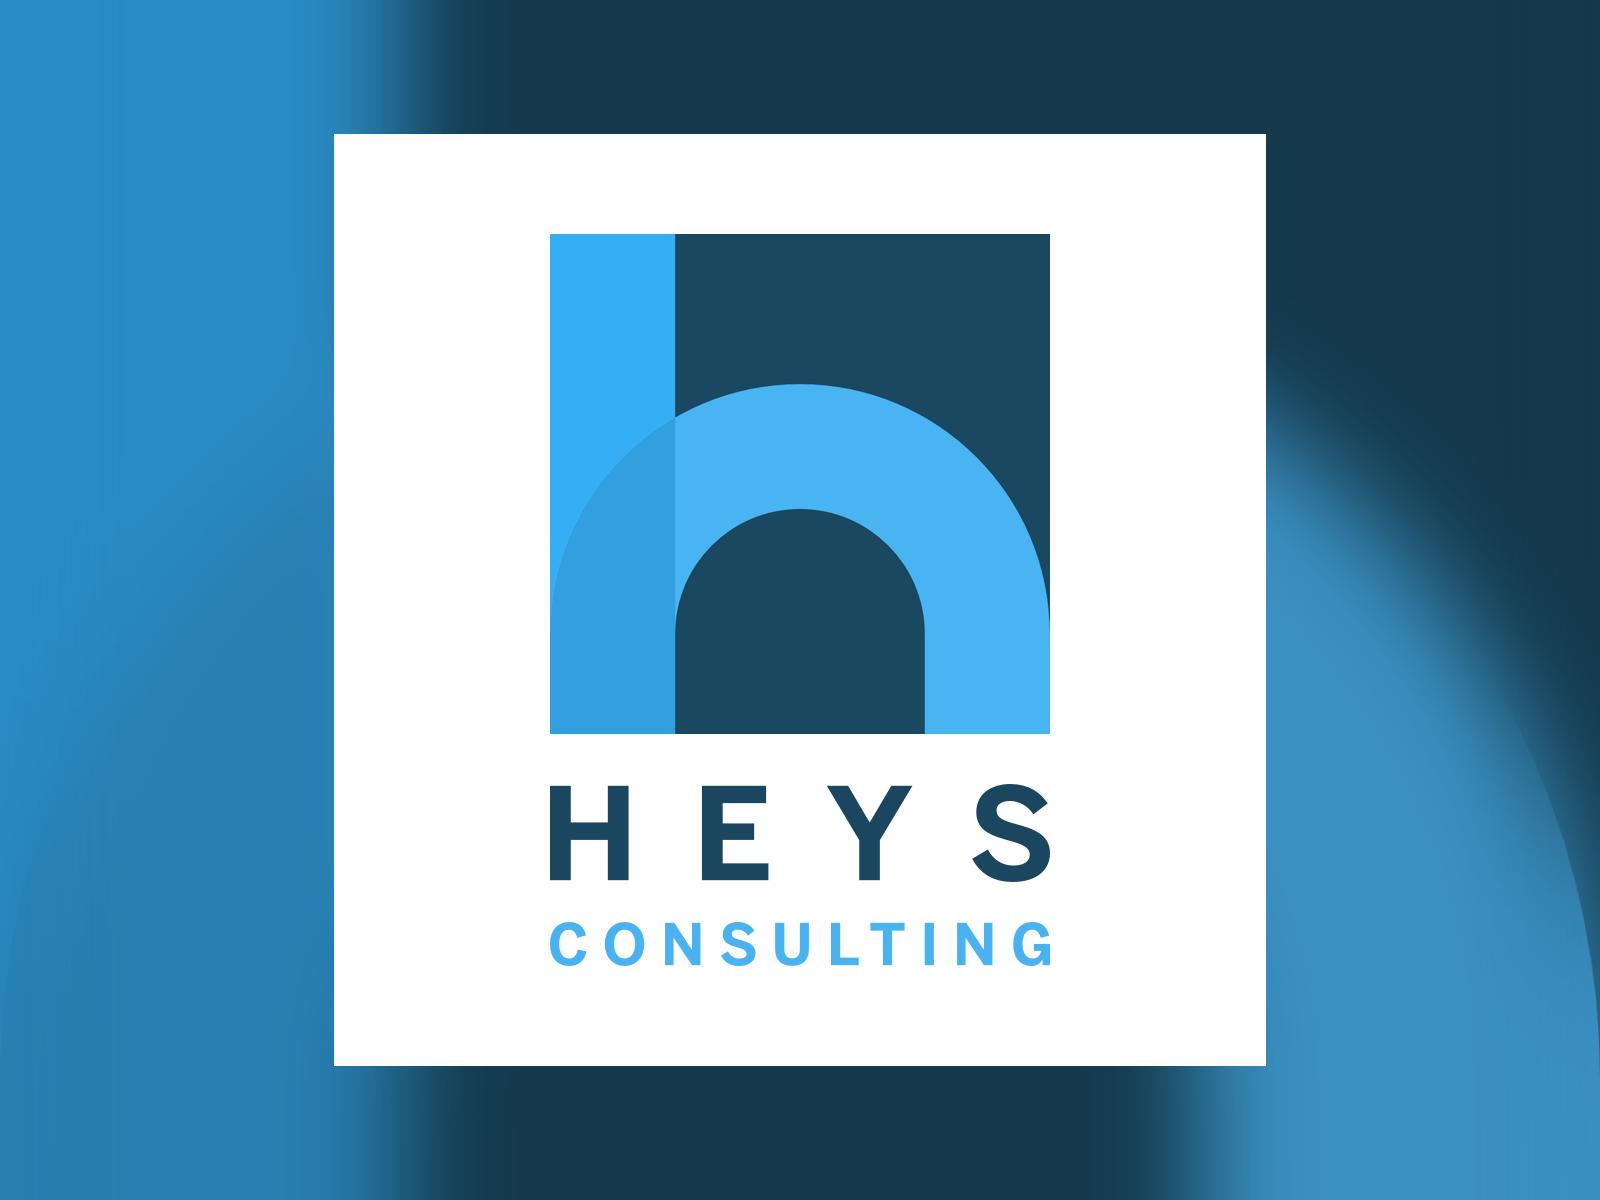 Heys consulting 4x